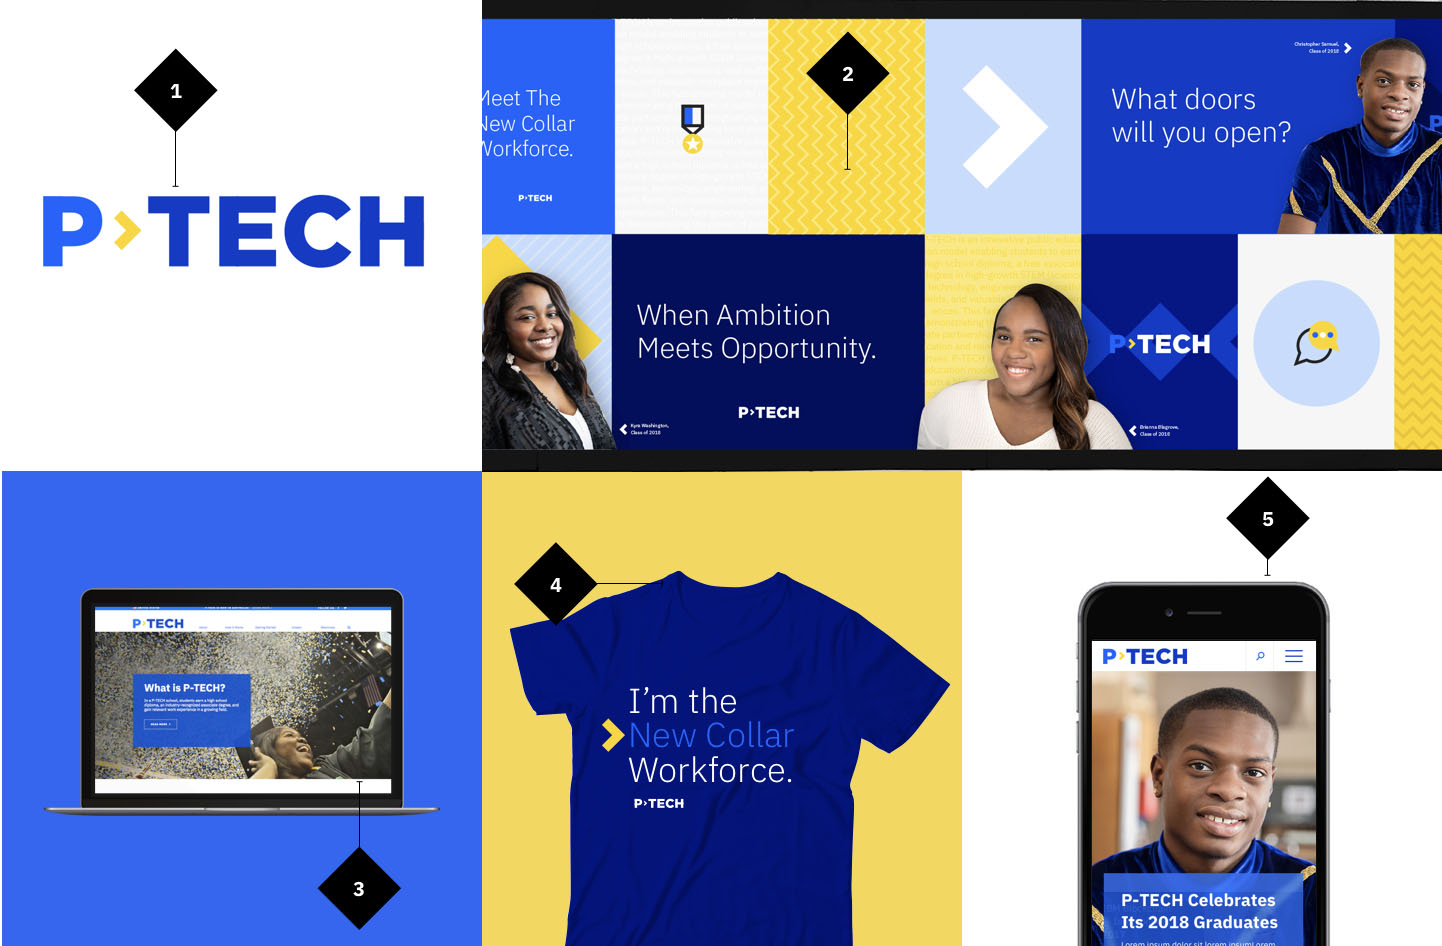 ptech visual design annotation.jpg